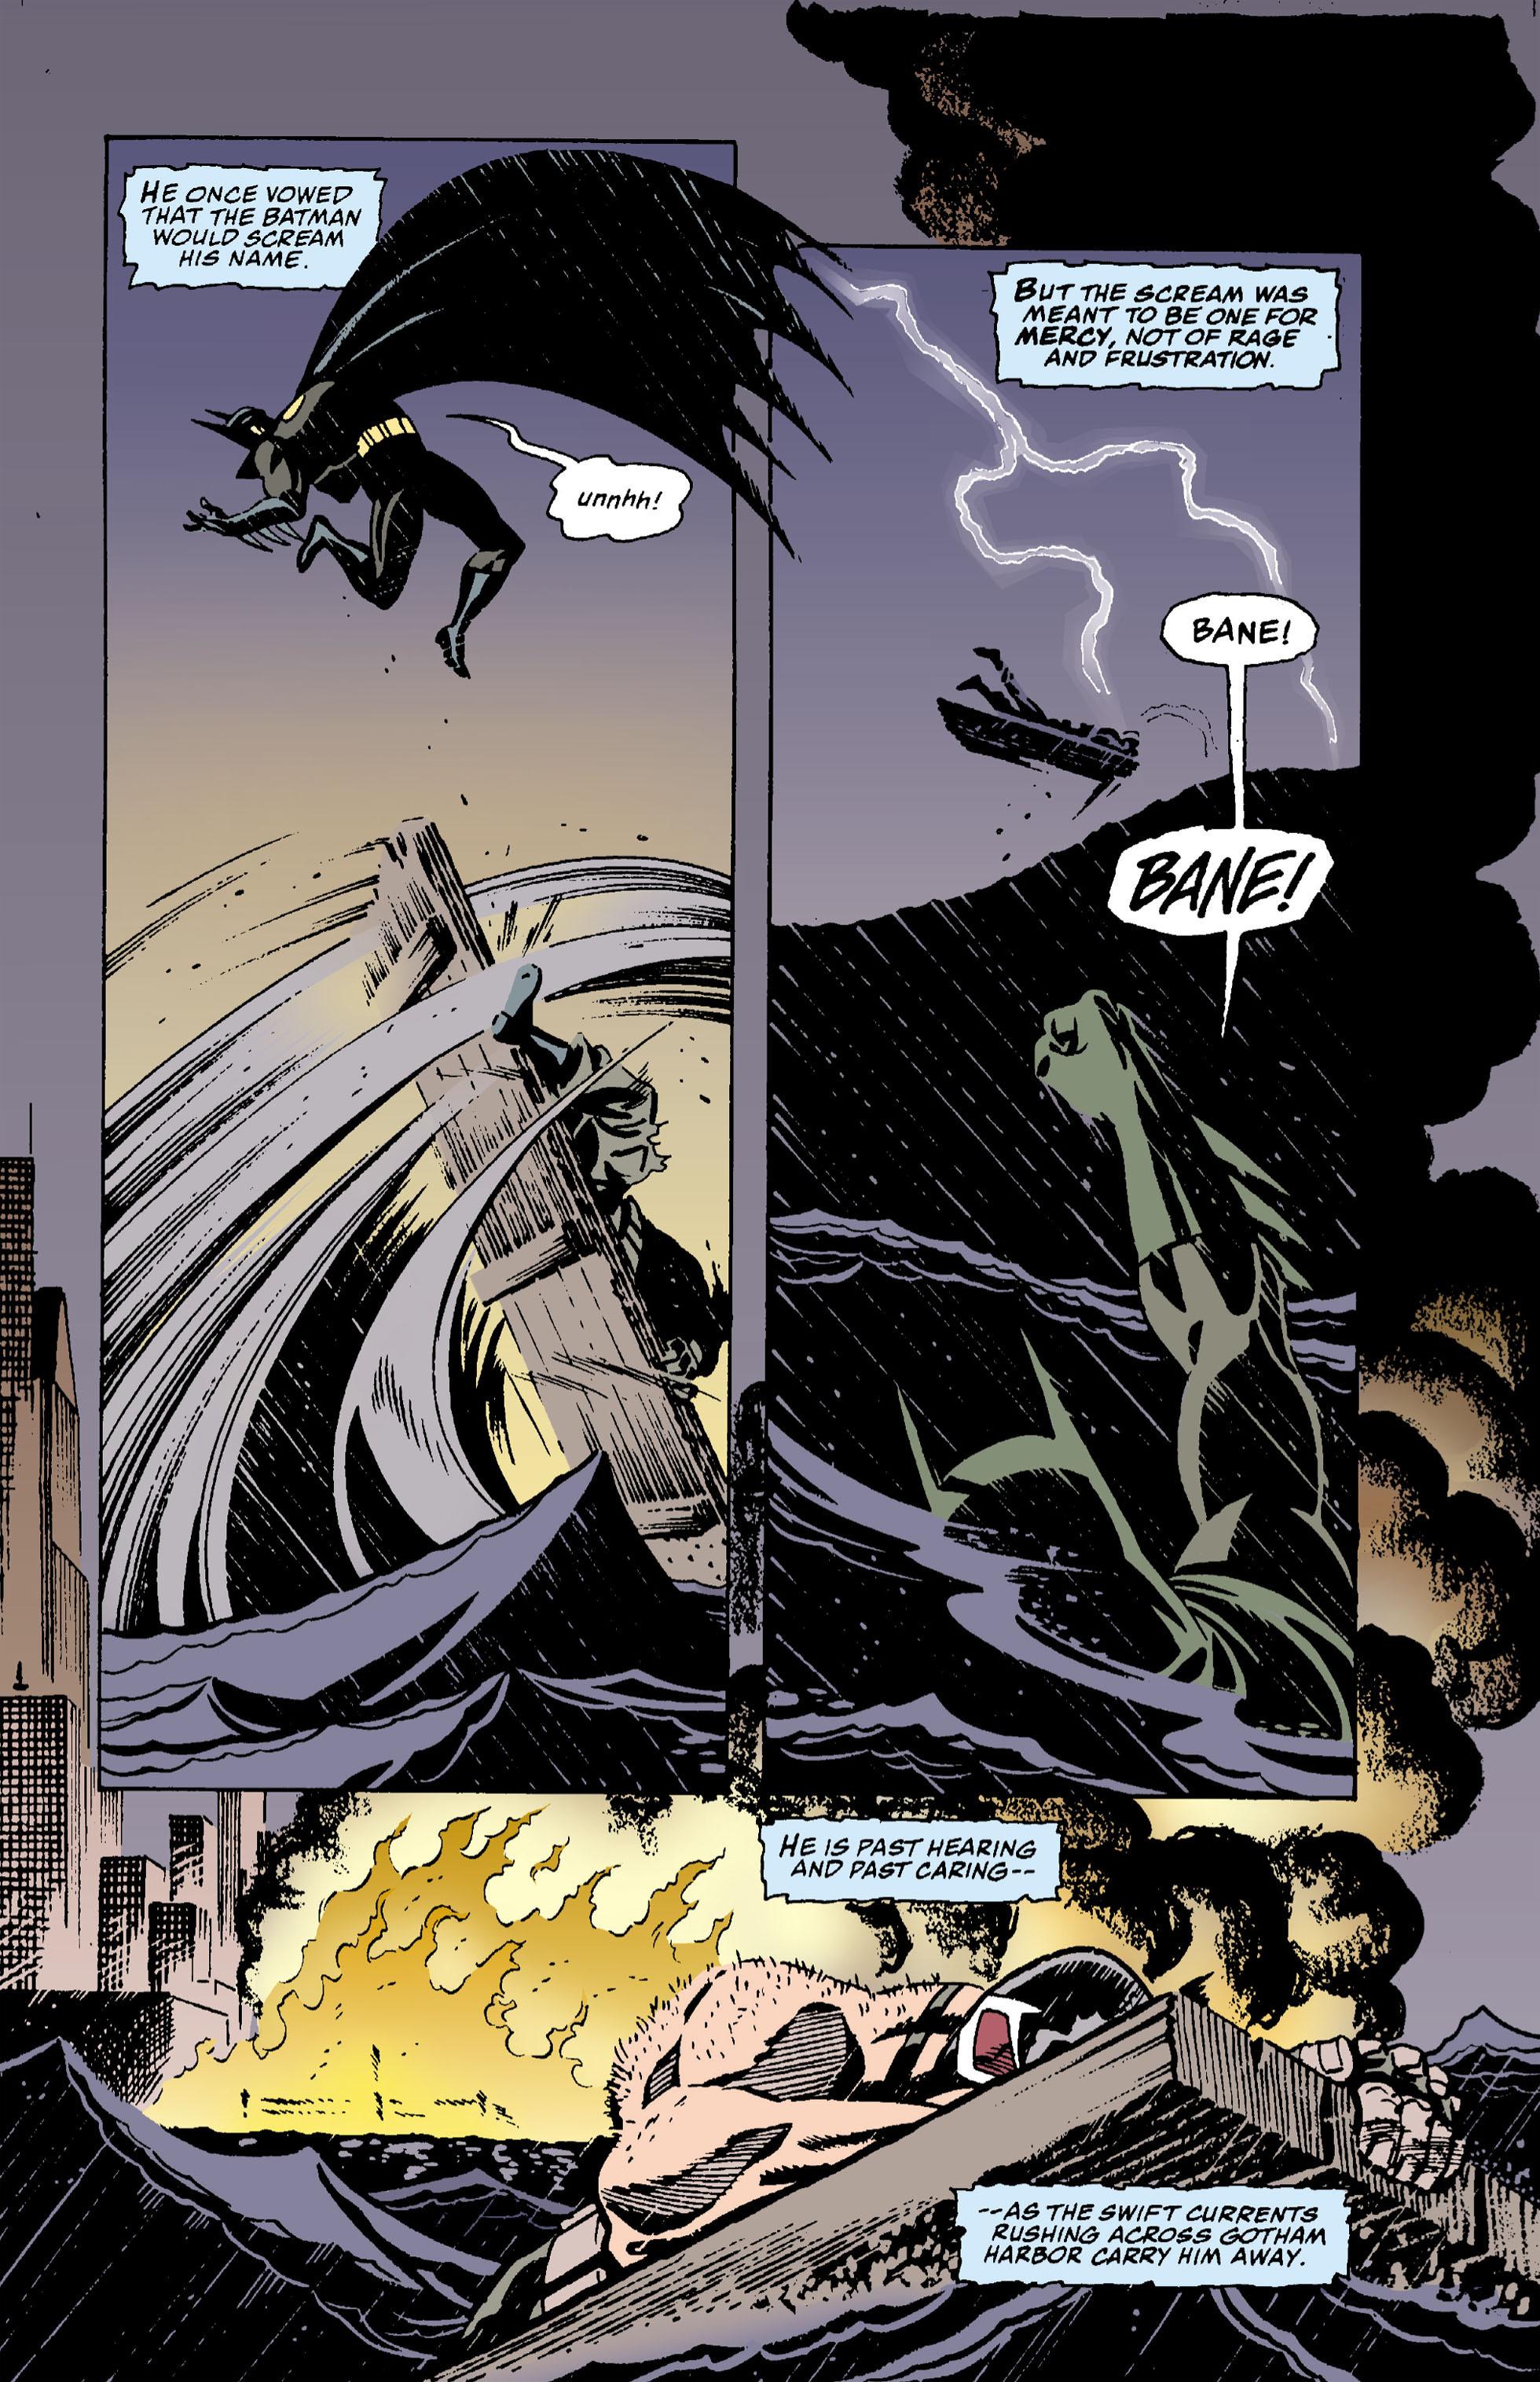 Read online Batman: Bane comic -  Issue # Full - 4